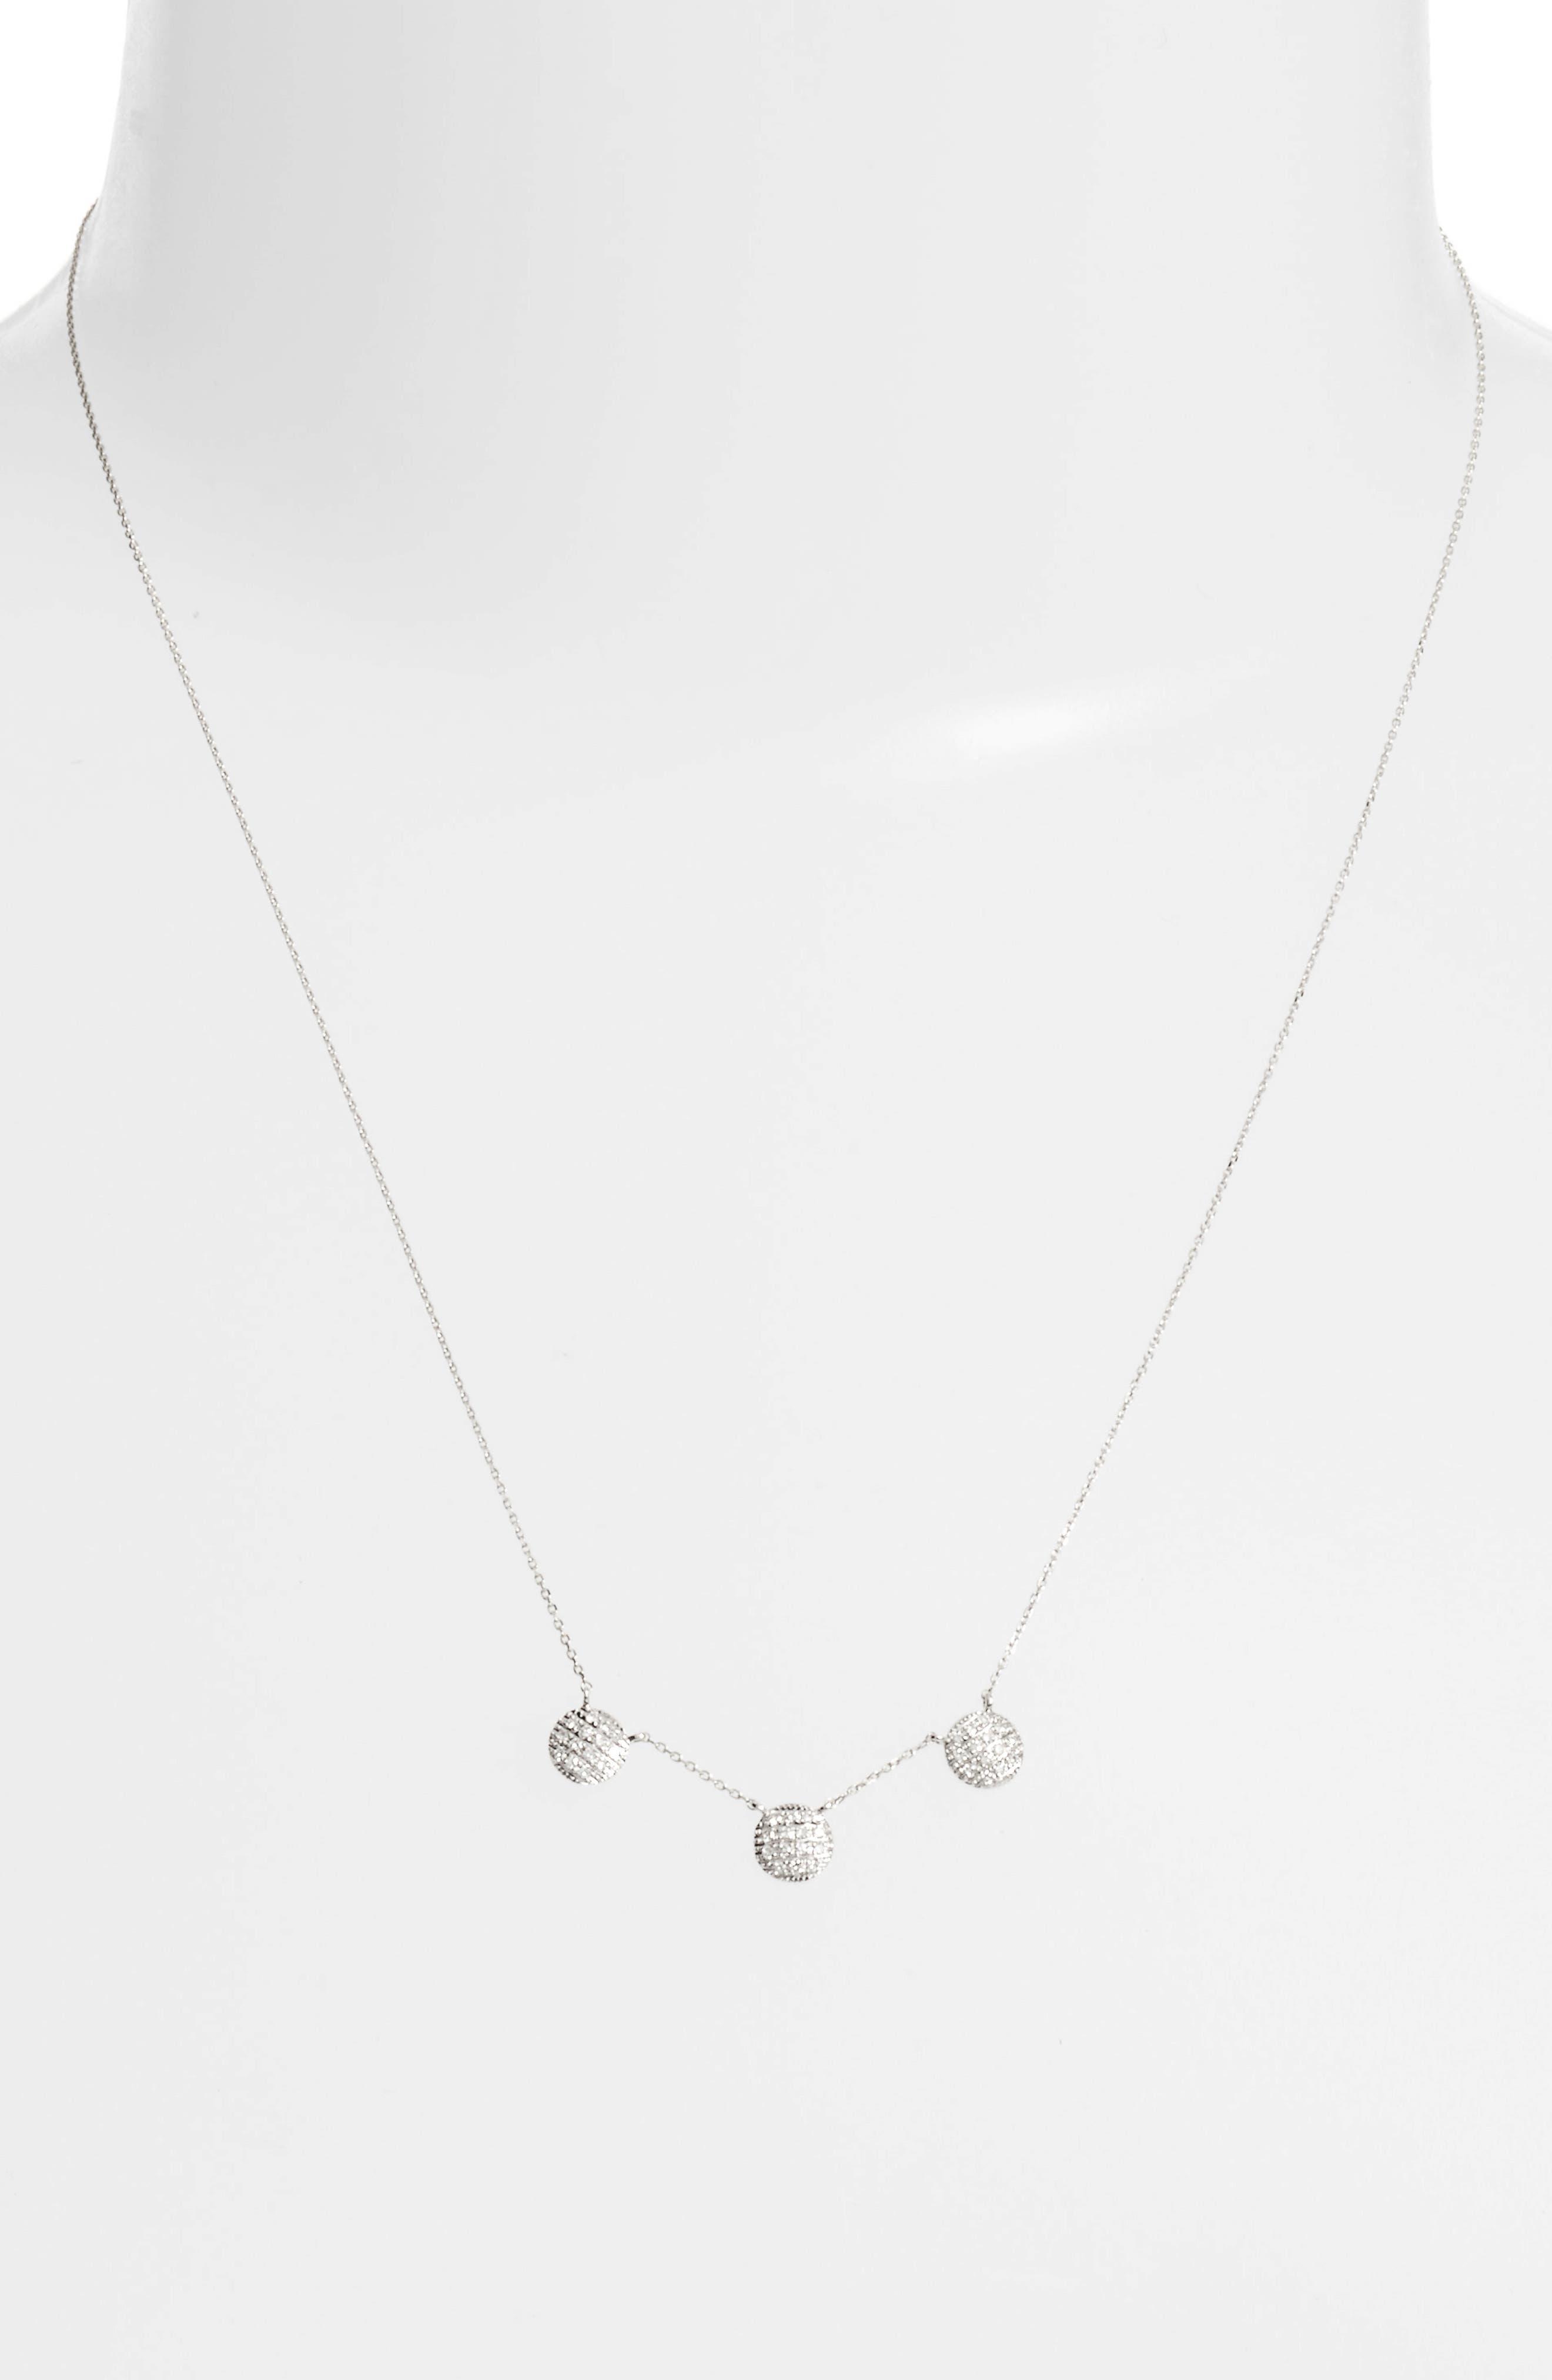 Lauren Joy Three-Disc Diamond Necklace,                             Alternate thumbnail 5, color,